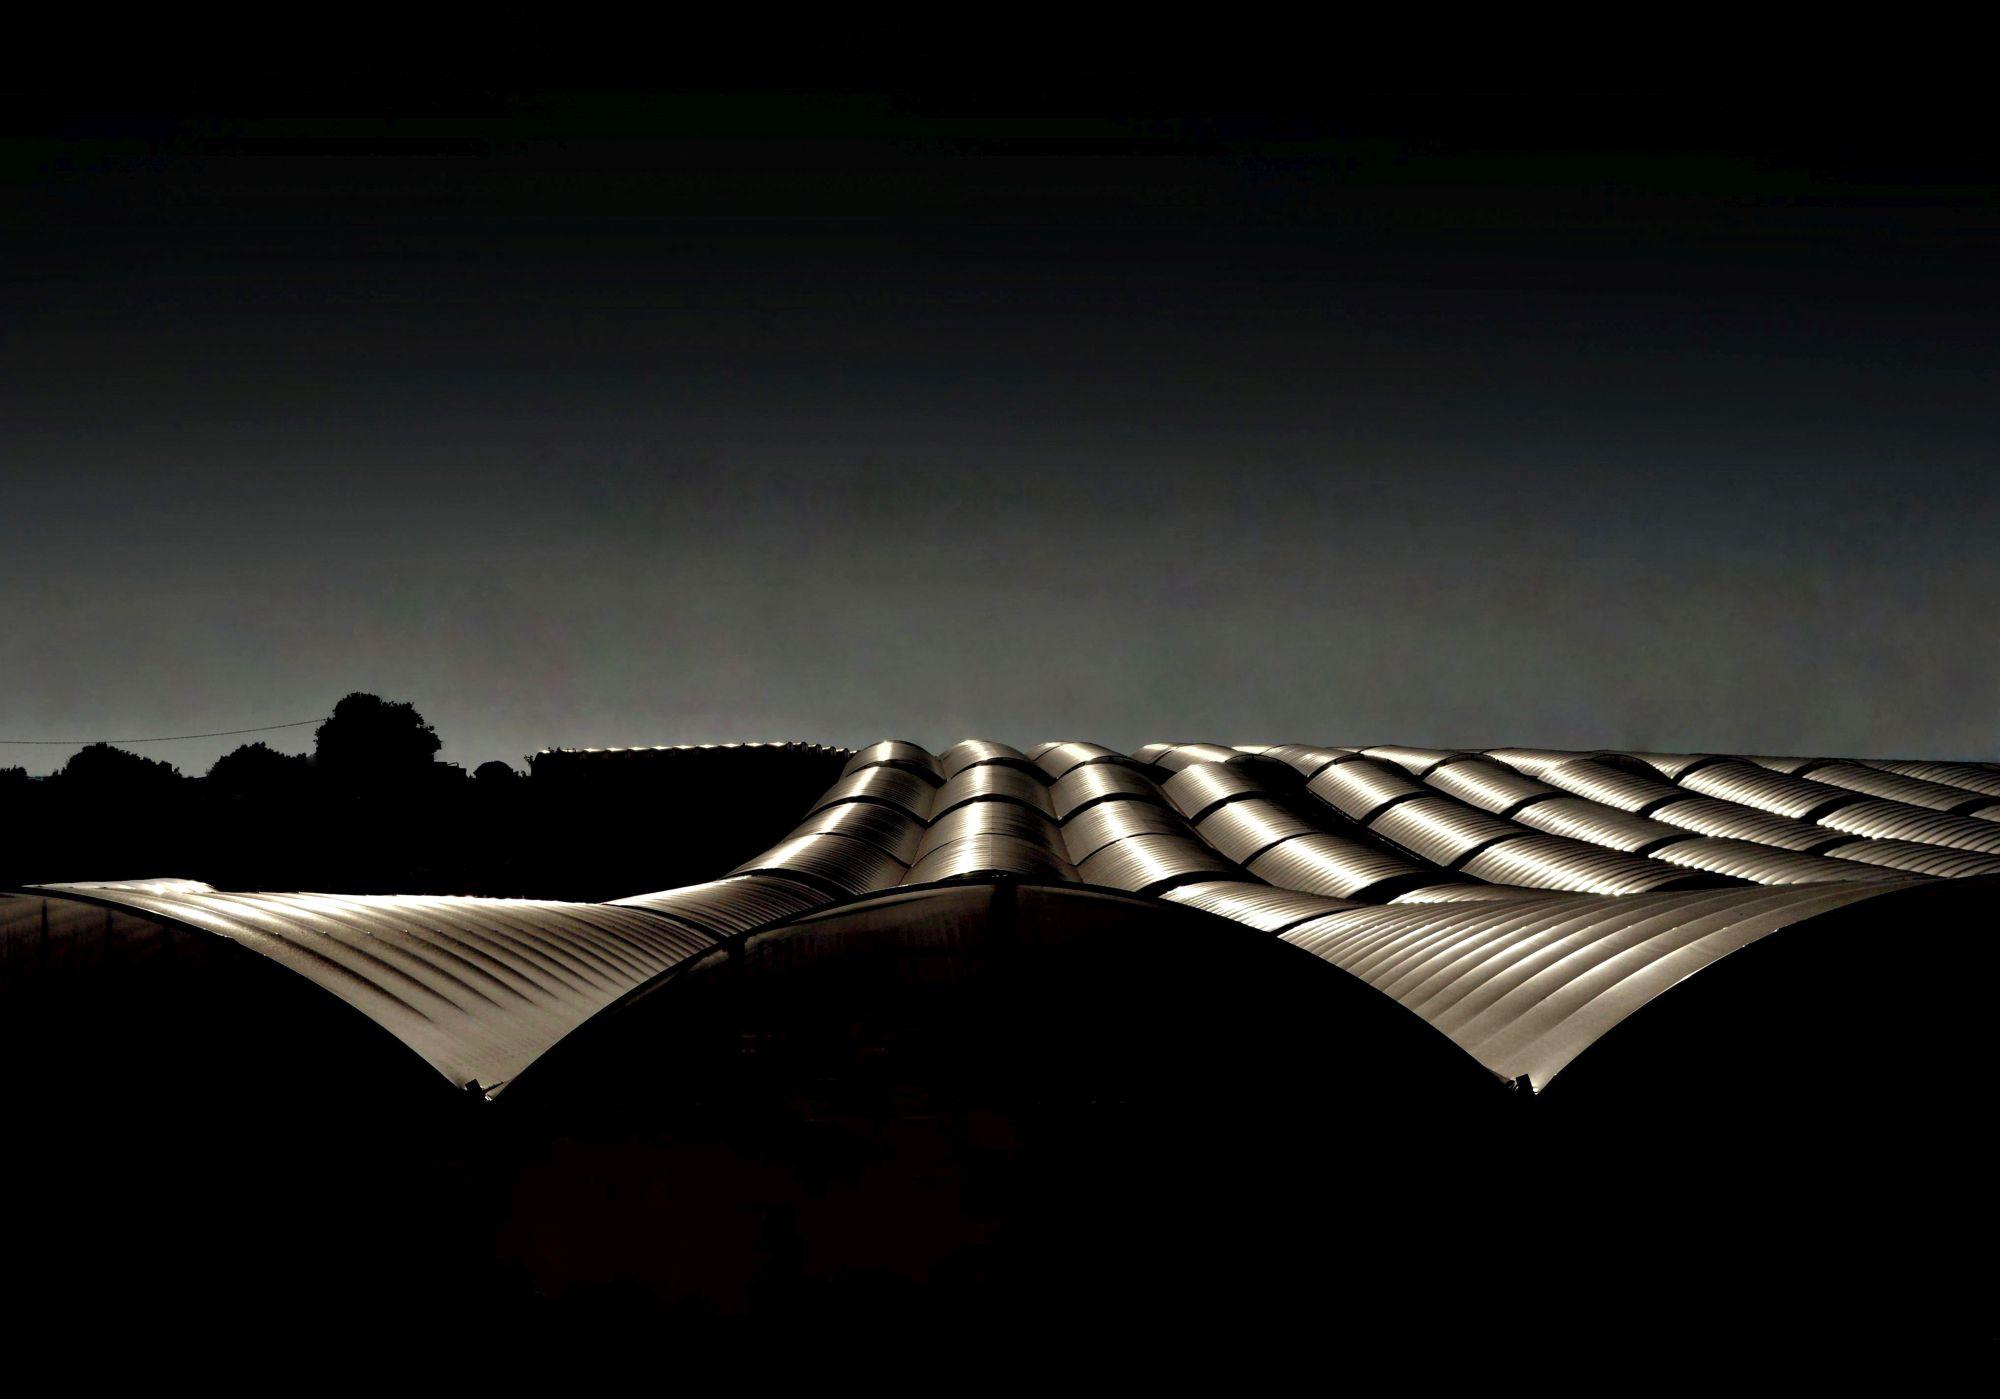 Cose di natura, Nature's Matters #11, Serre/Greenhouses, 2012